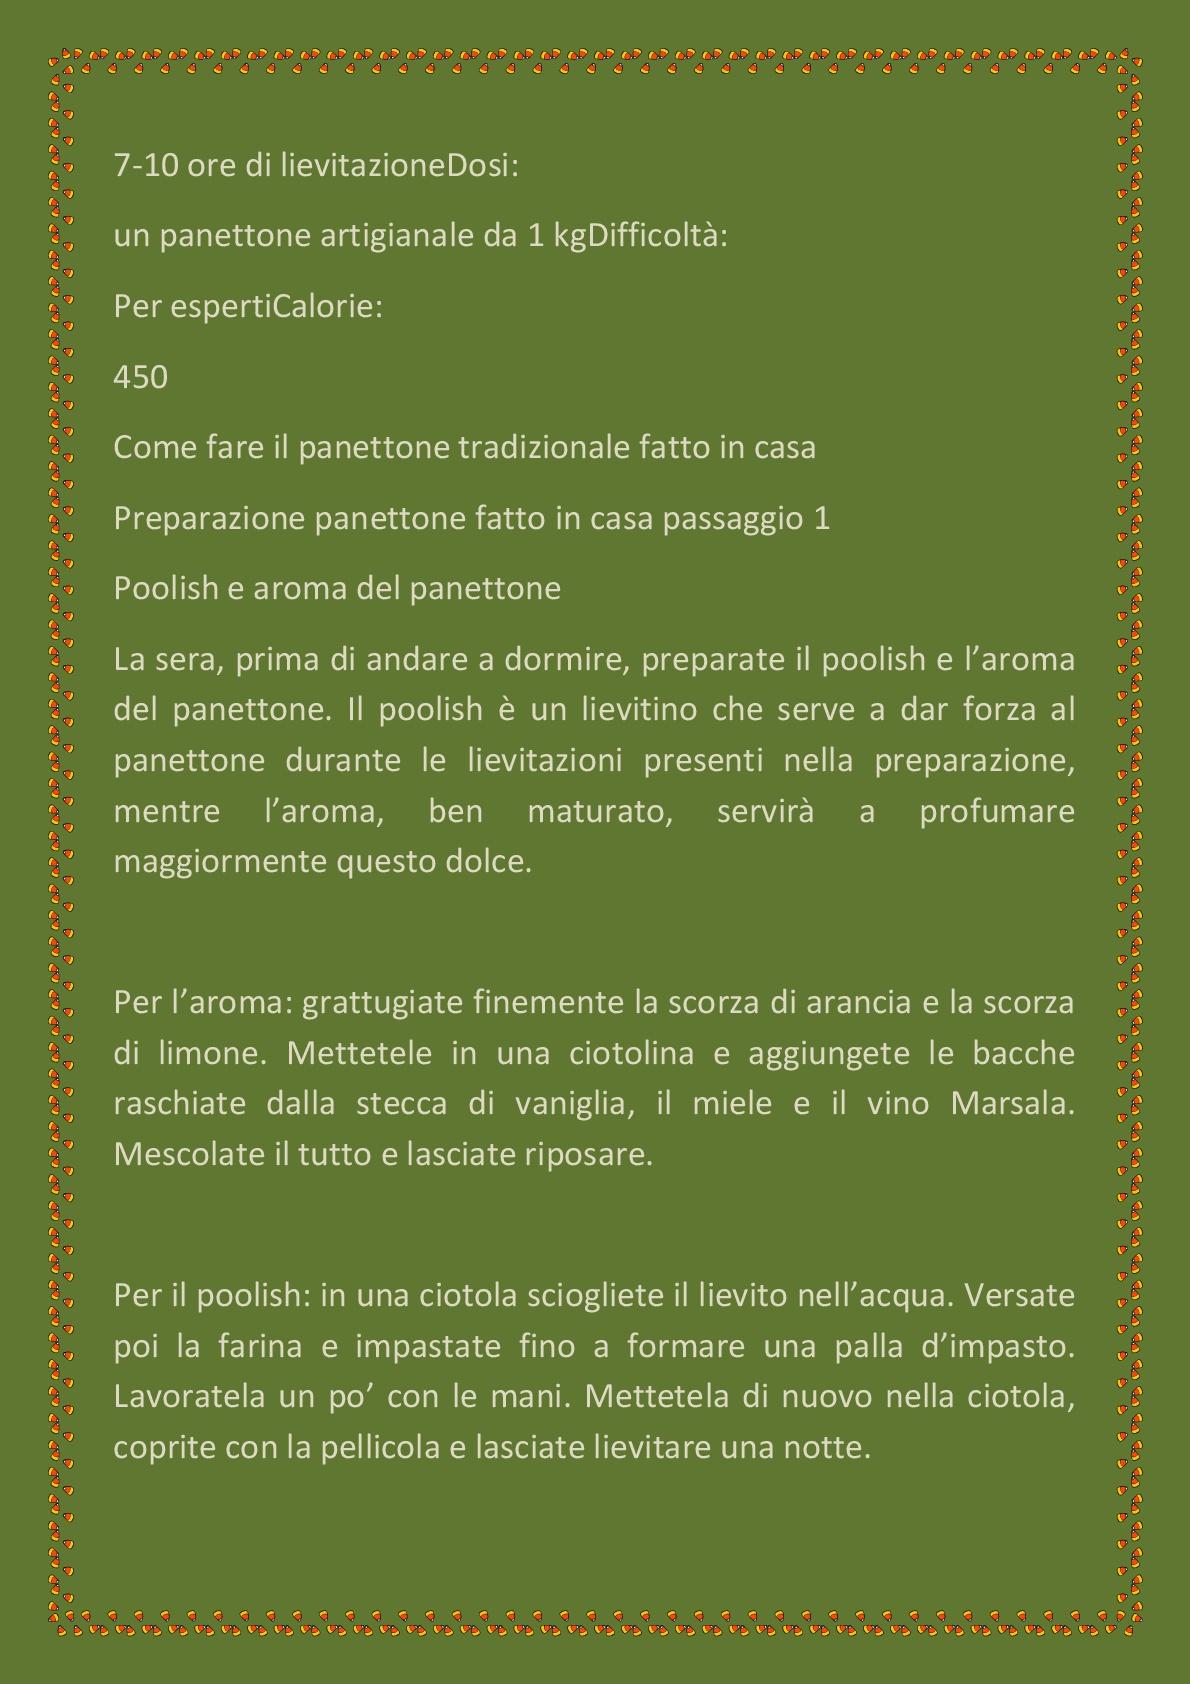 IL-RICETTARIO-(1)-003